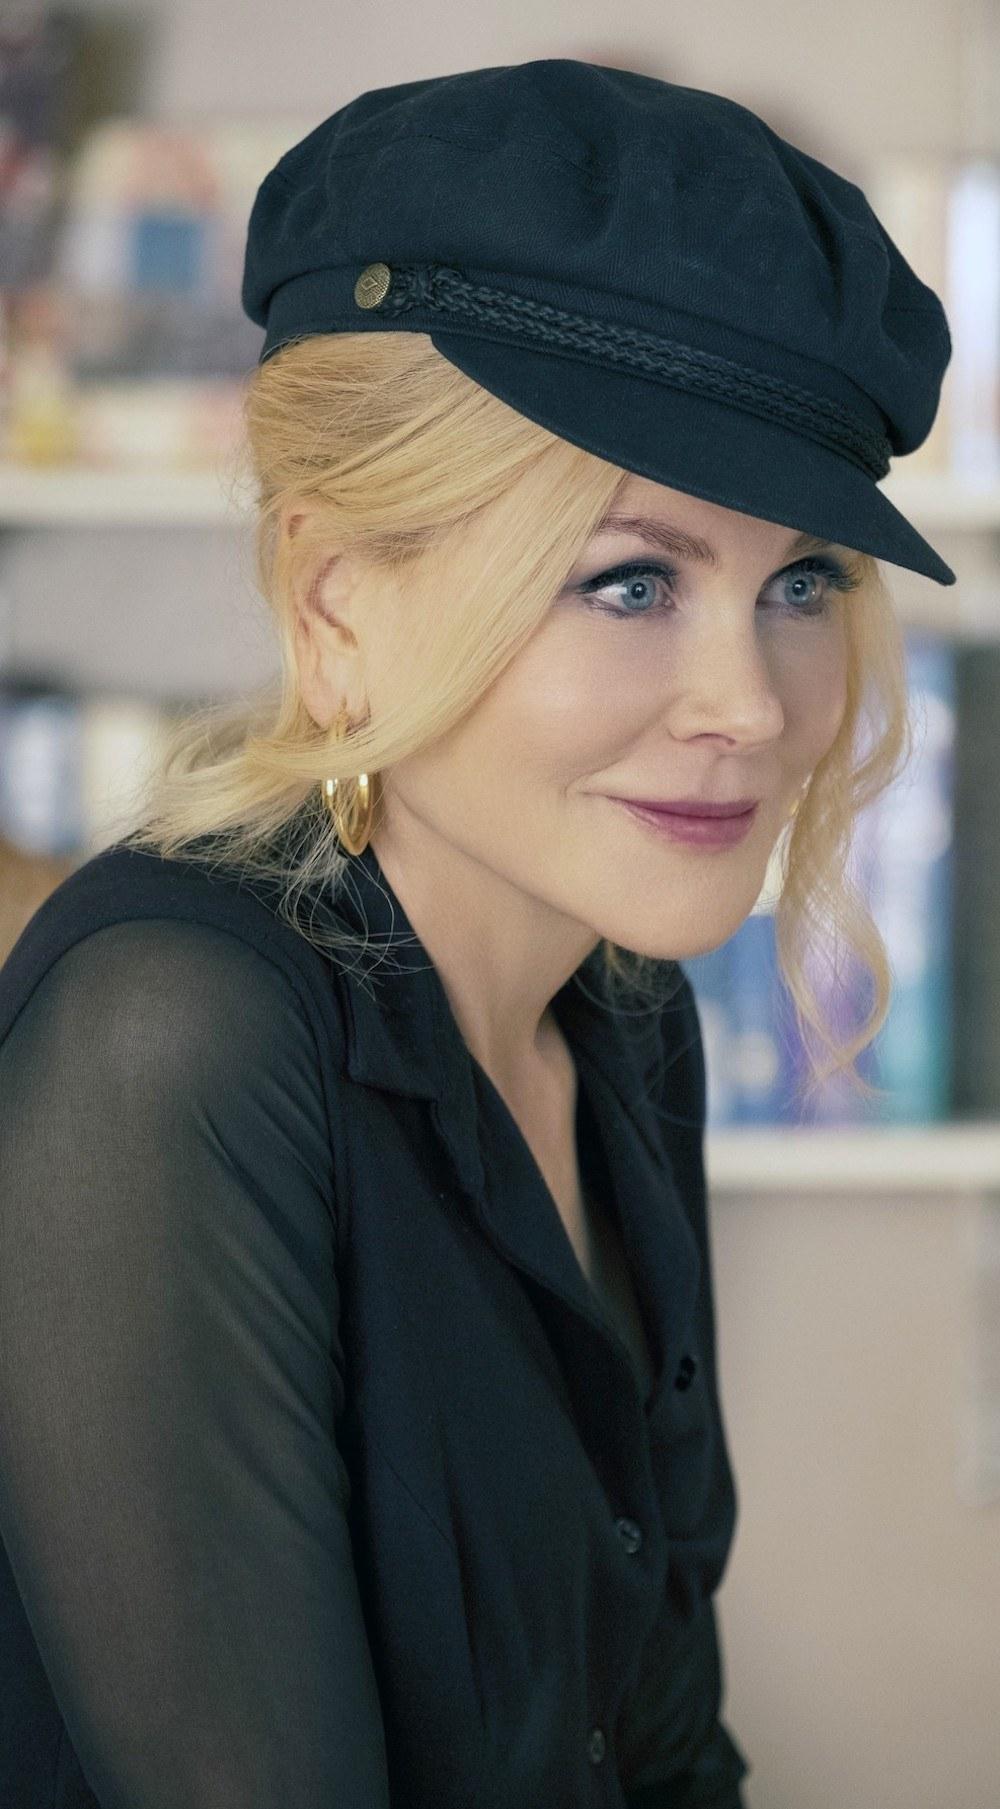 Nicole Kidman wearing a short black hat with a black blouse